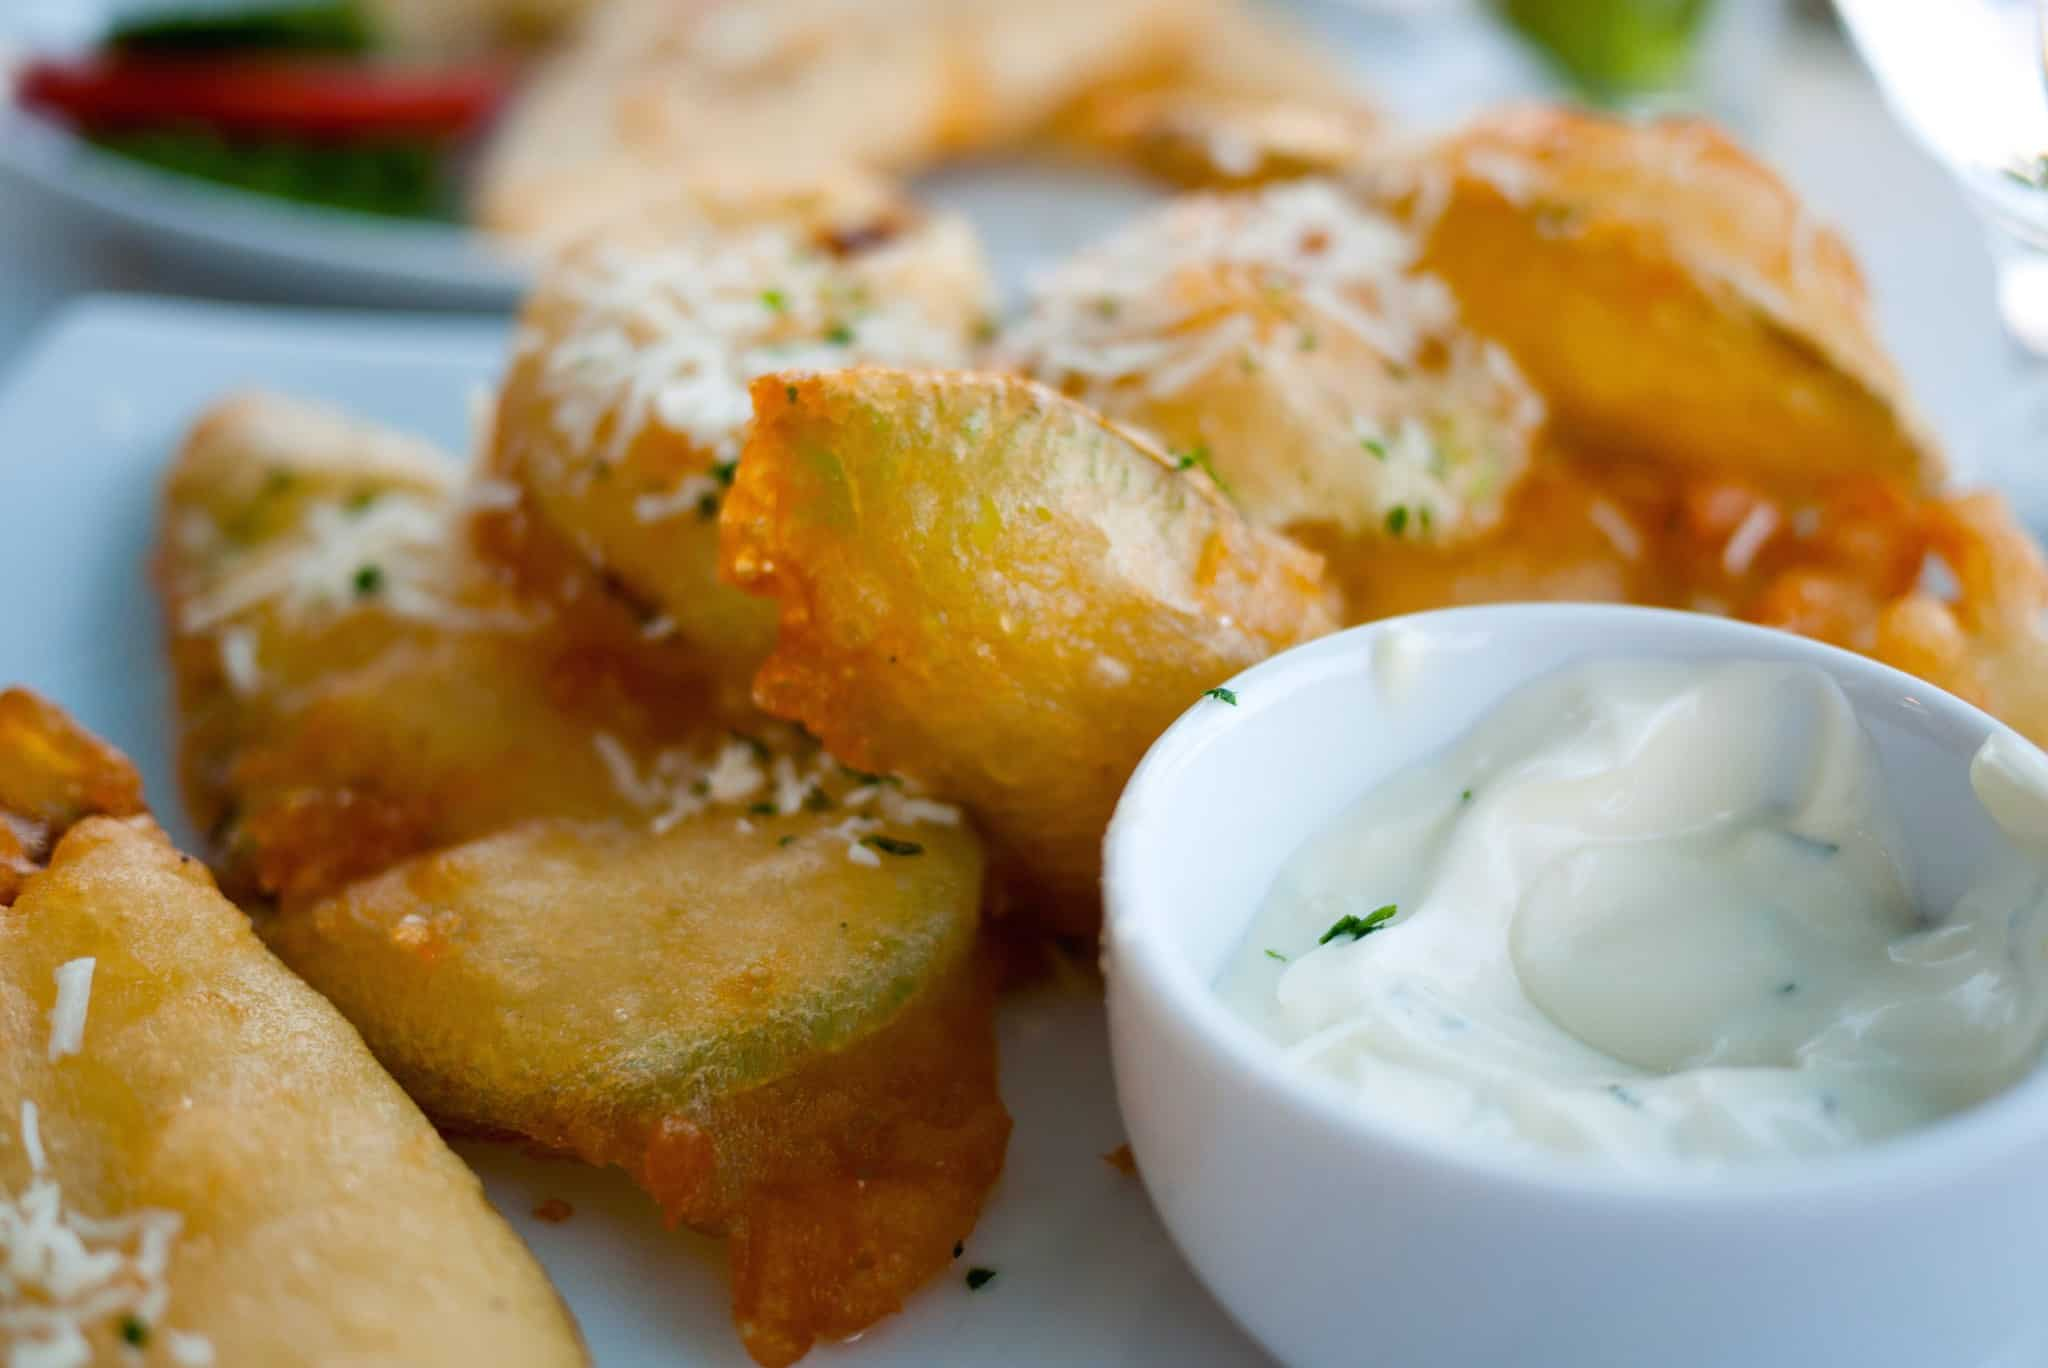 Crispy Fried Zucchini - Courgette recipe (Greek Kolokithakia tiganita)